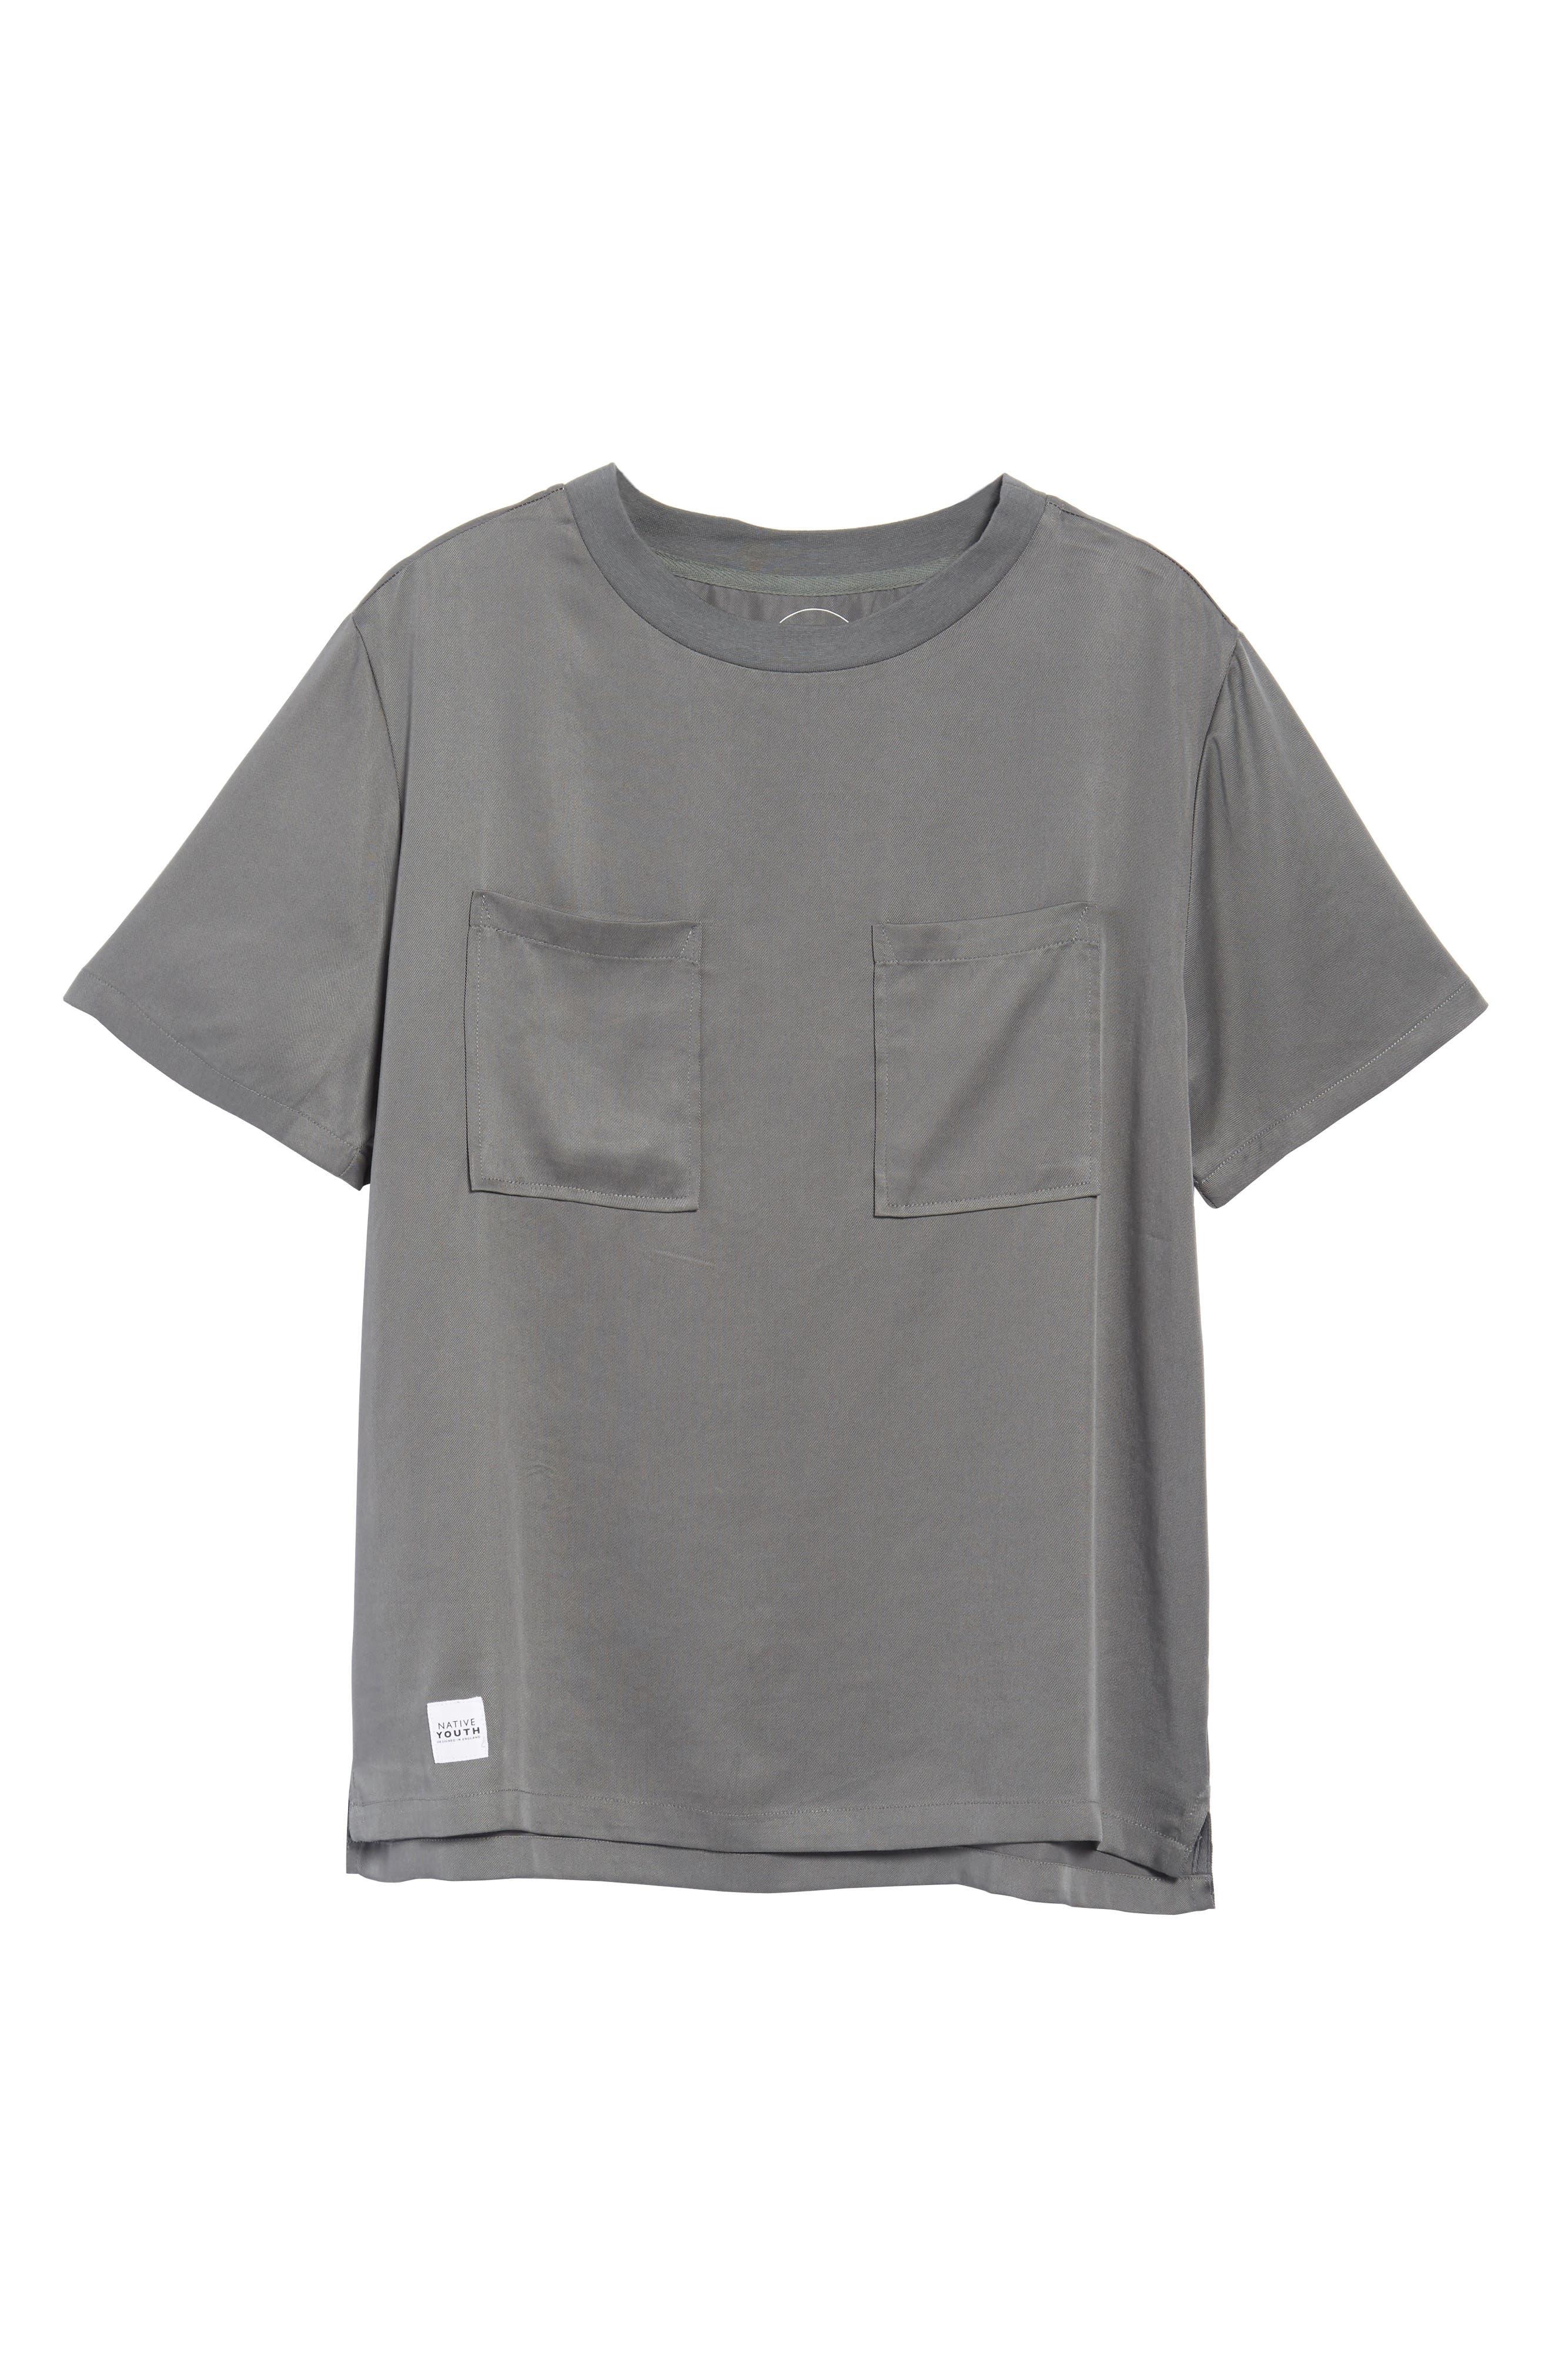 Denali Woven T-Shirt,                             Alternate thumbnail 6, color,                             Grey